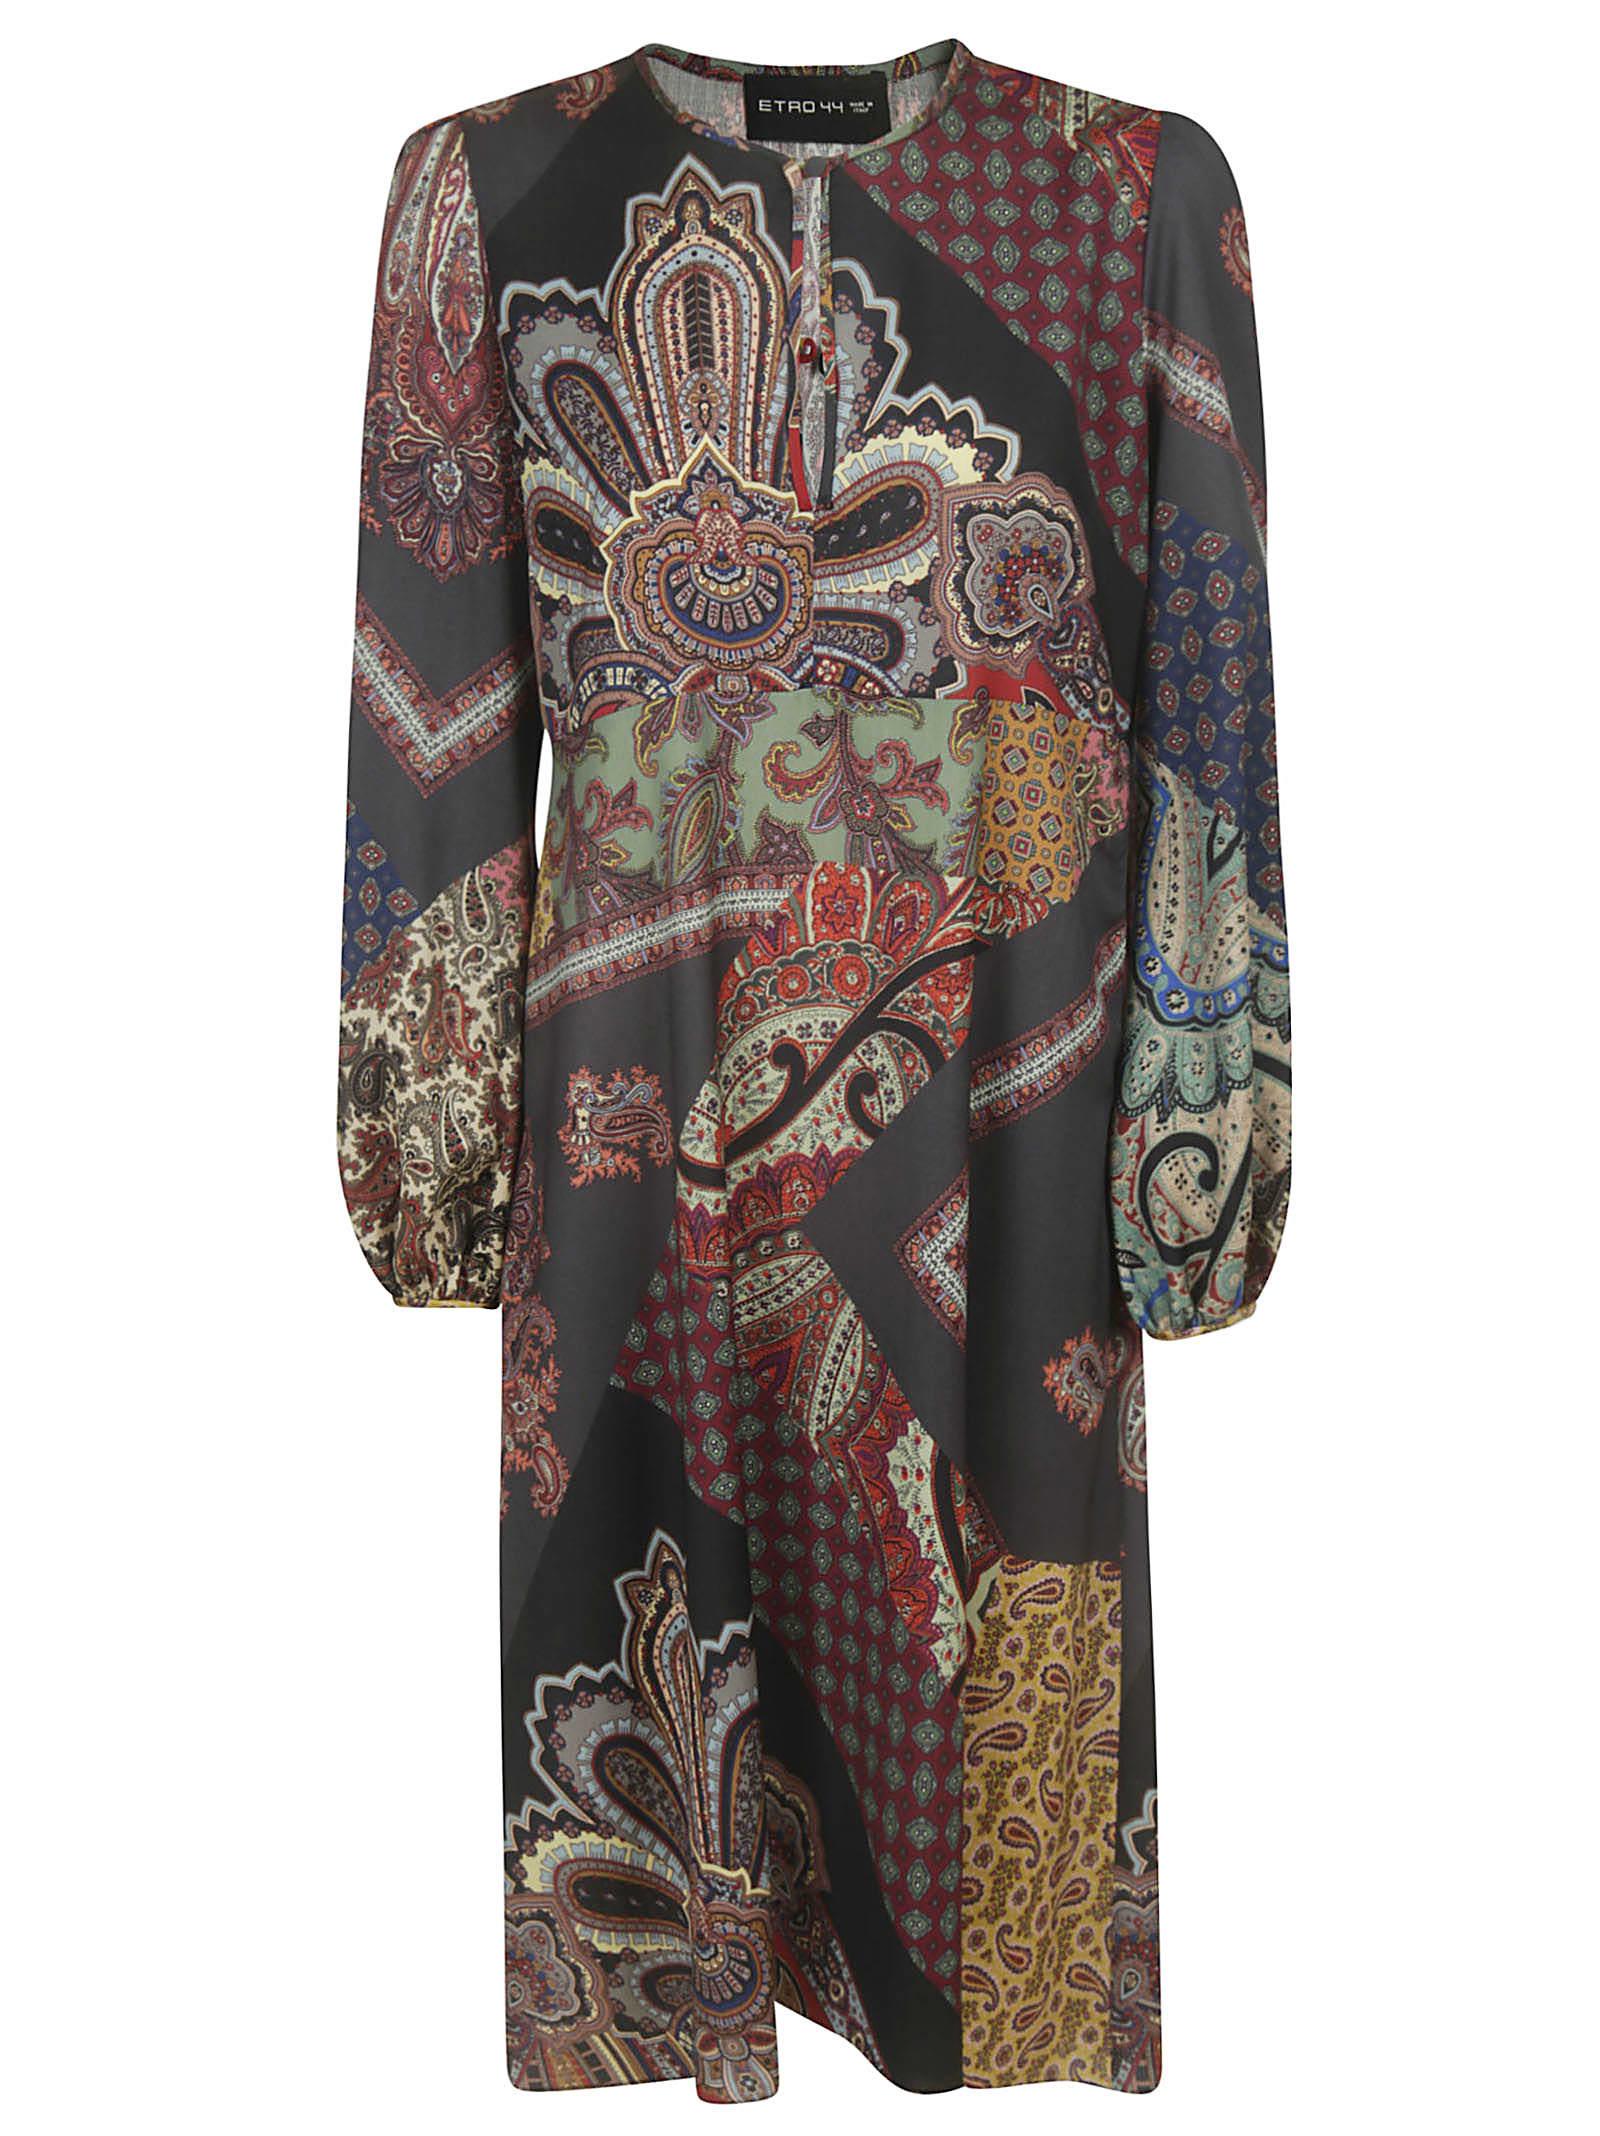 Etro Abstract Print Dress